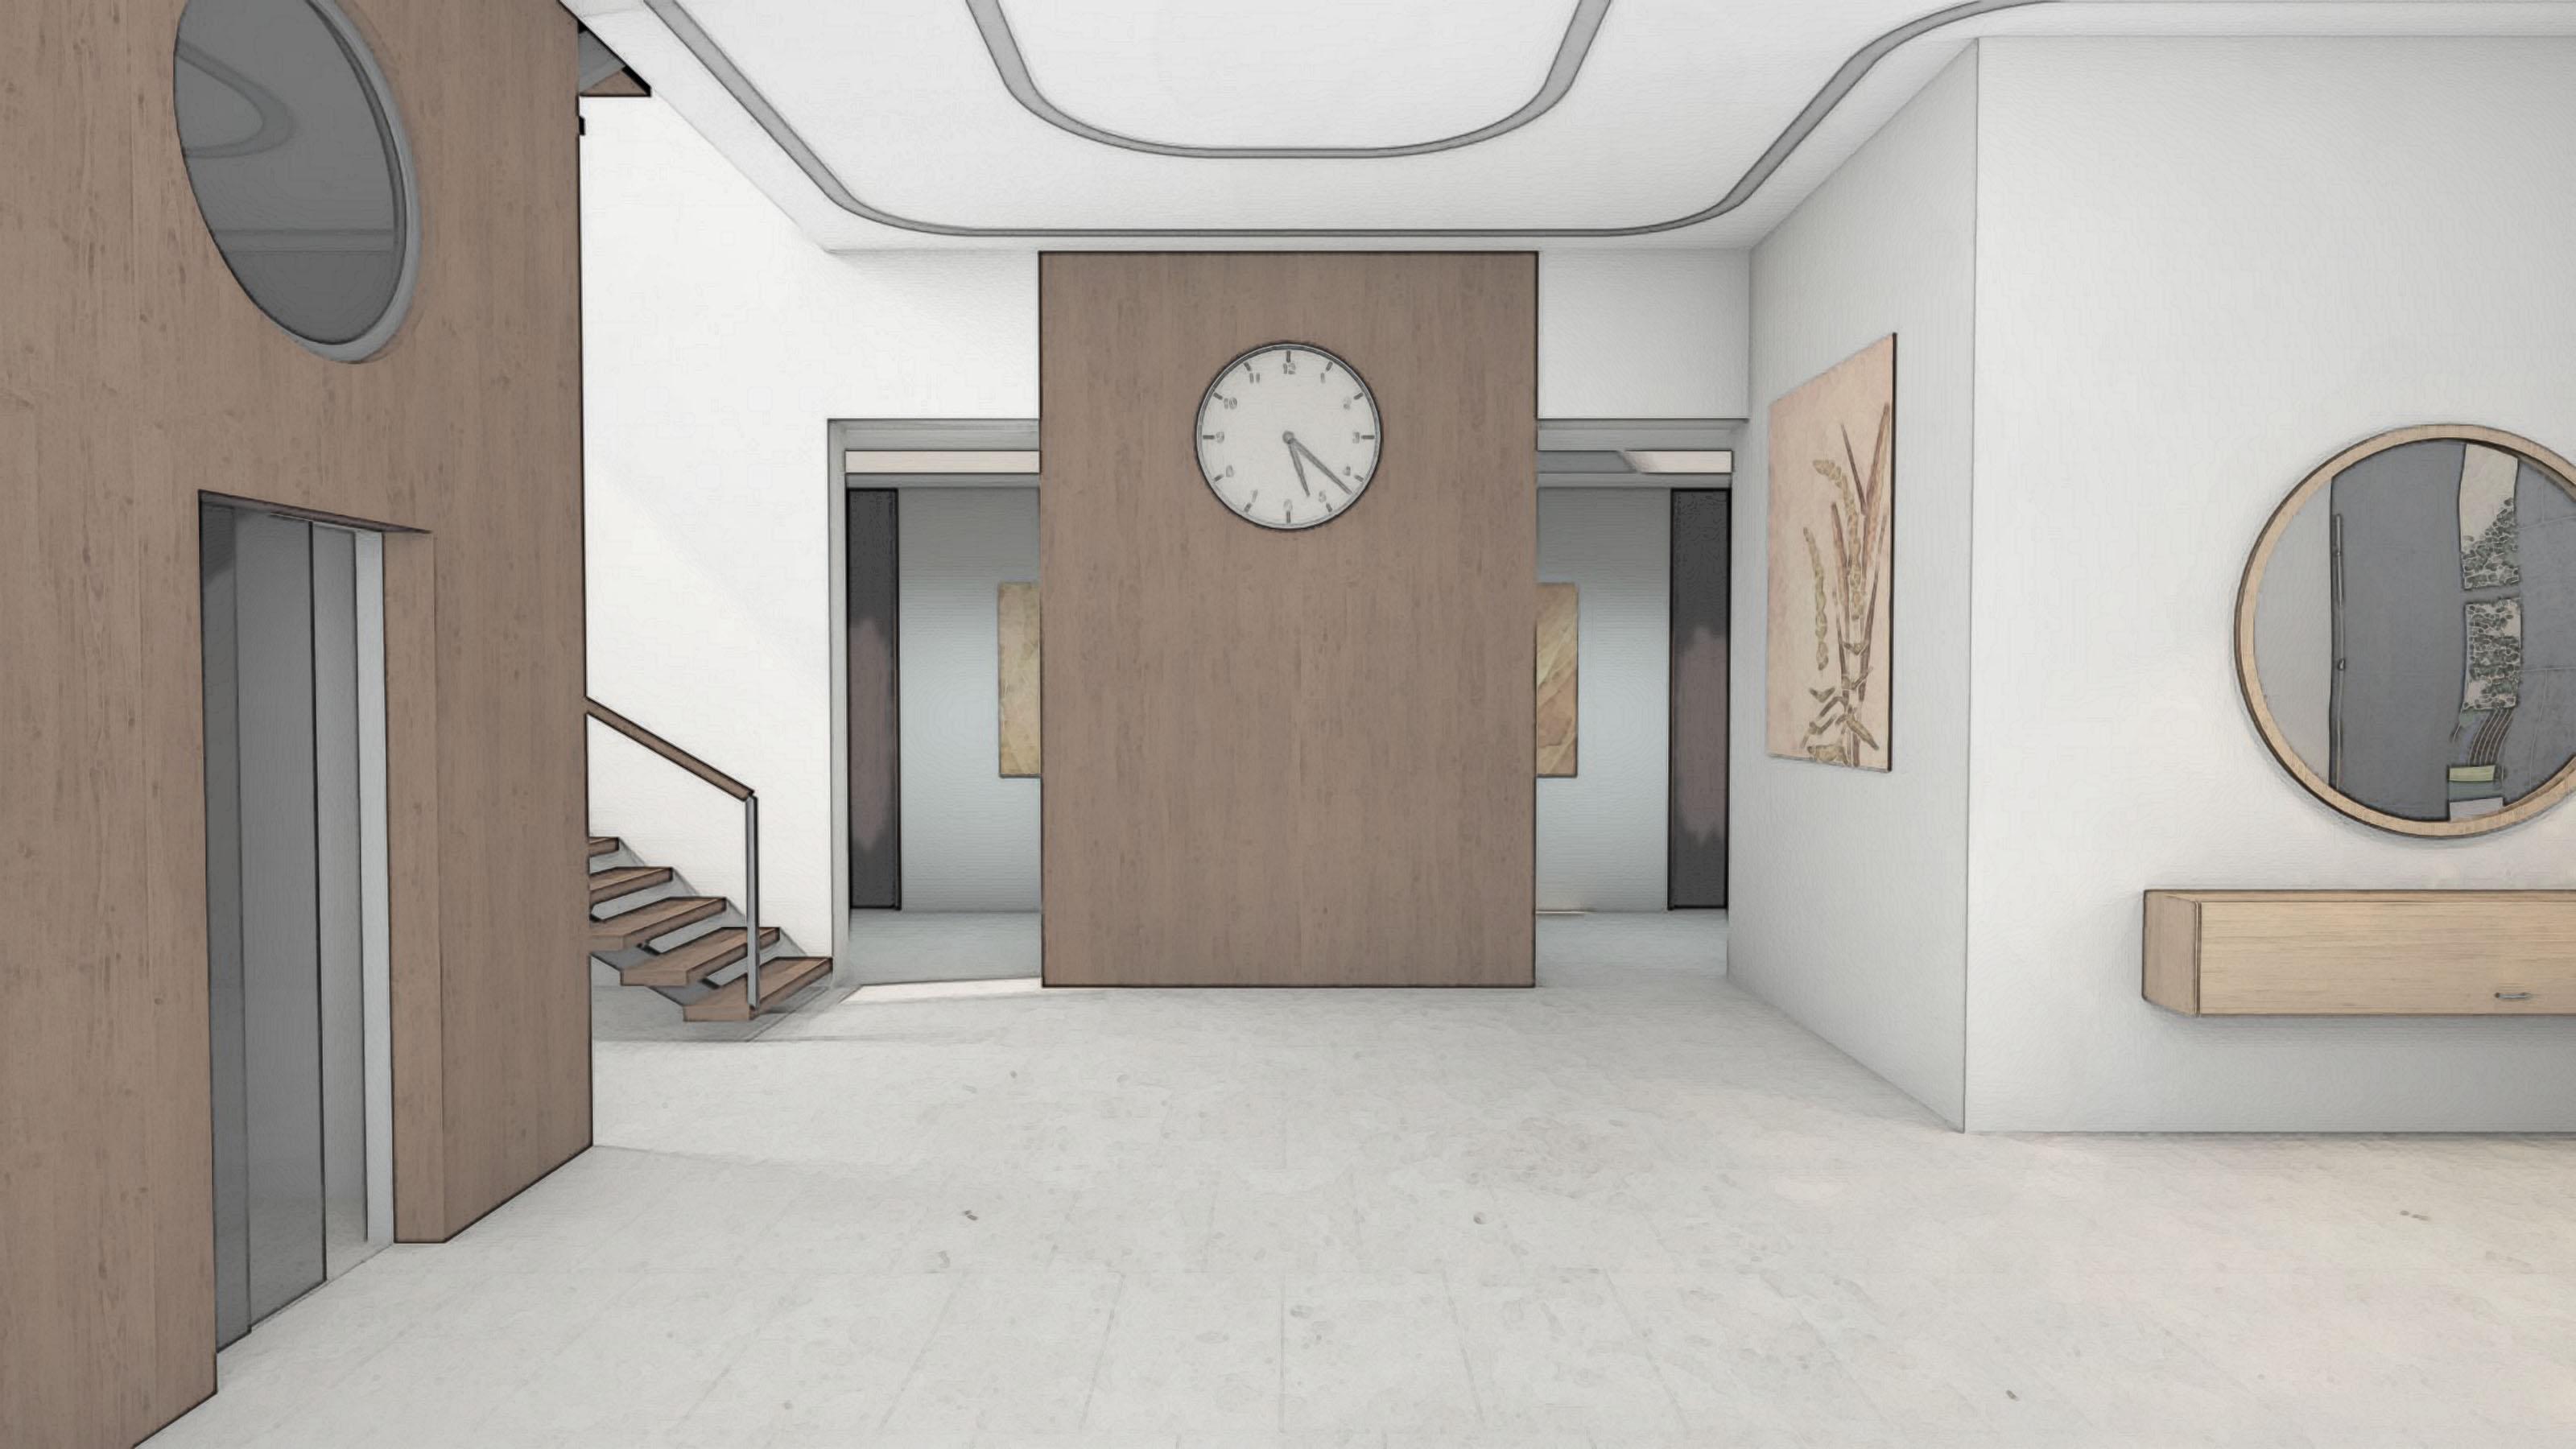 Изображение для проекта Проект особняка в Латвии в стиле модерн 2897